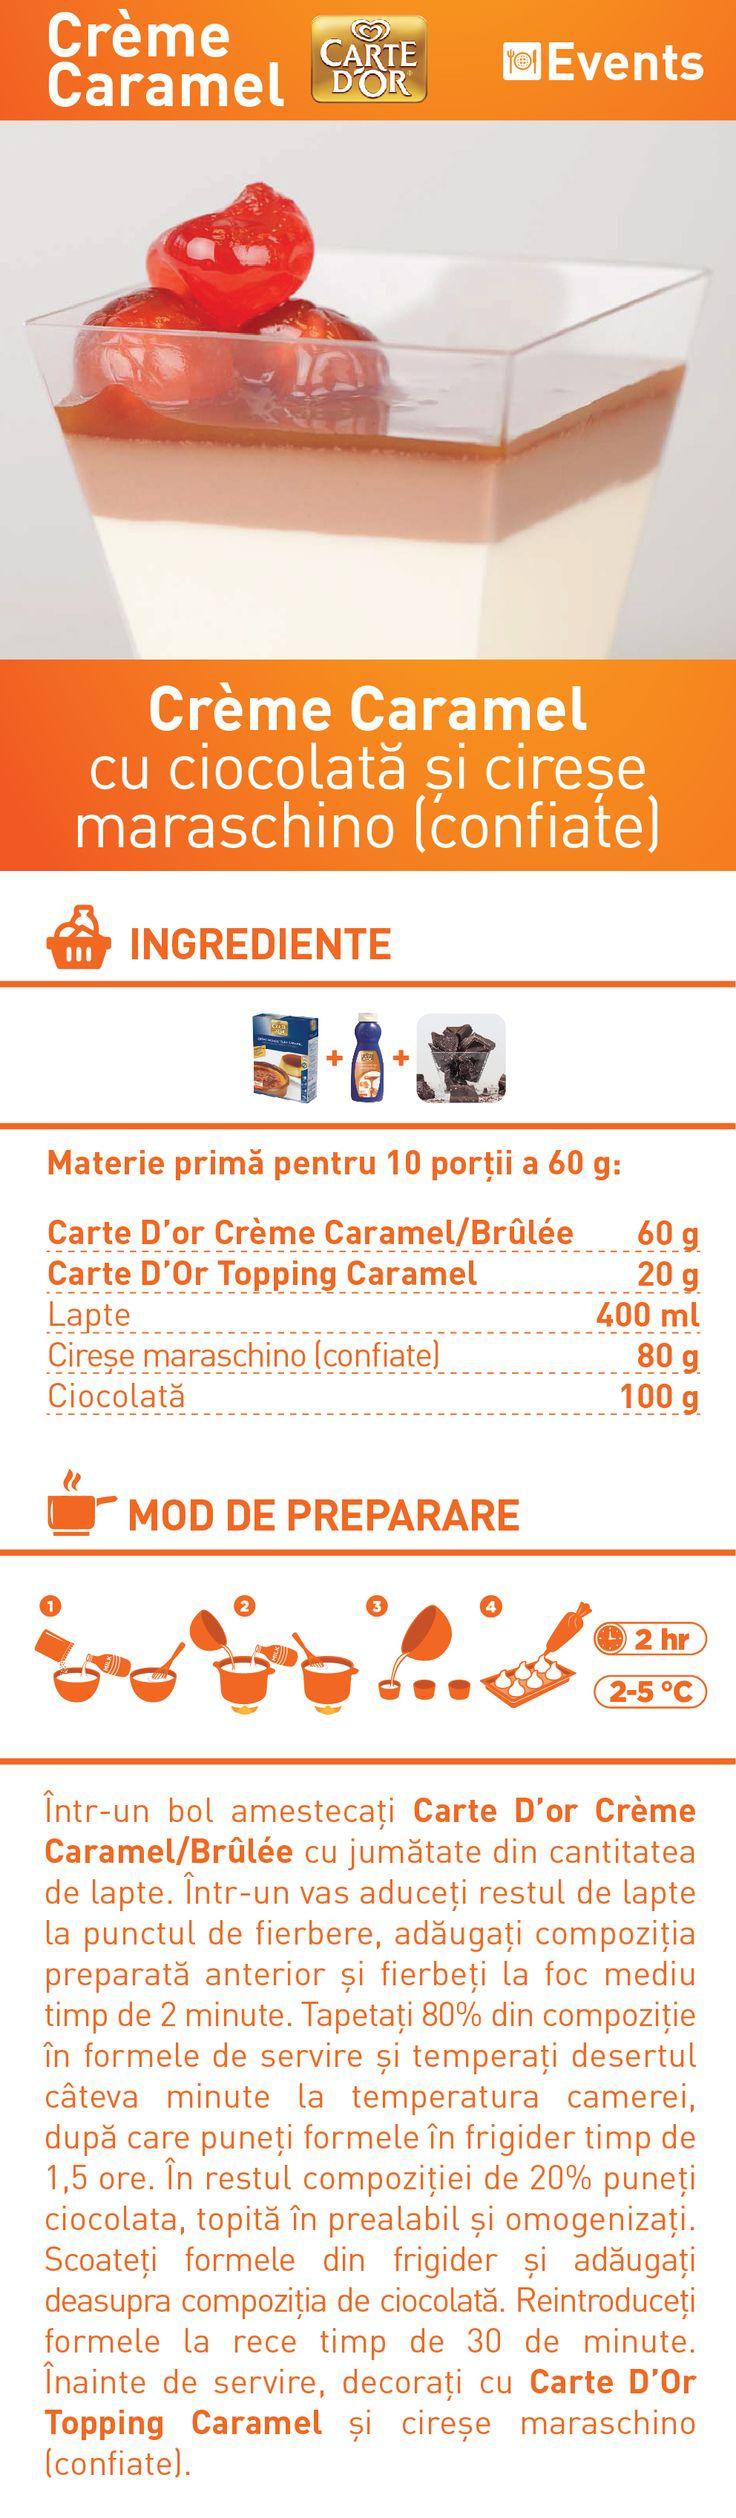 Creme Caramel cu ciocolata si cirese maraschino (confiate) - RETETA